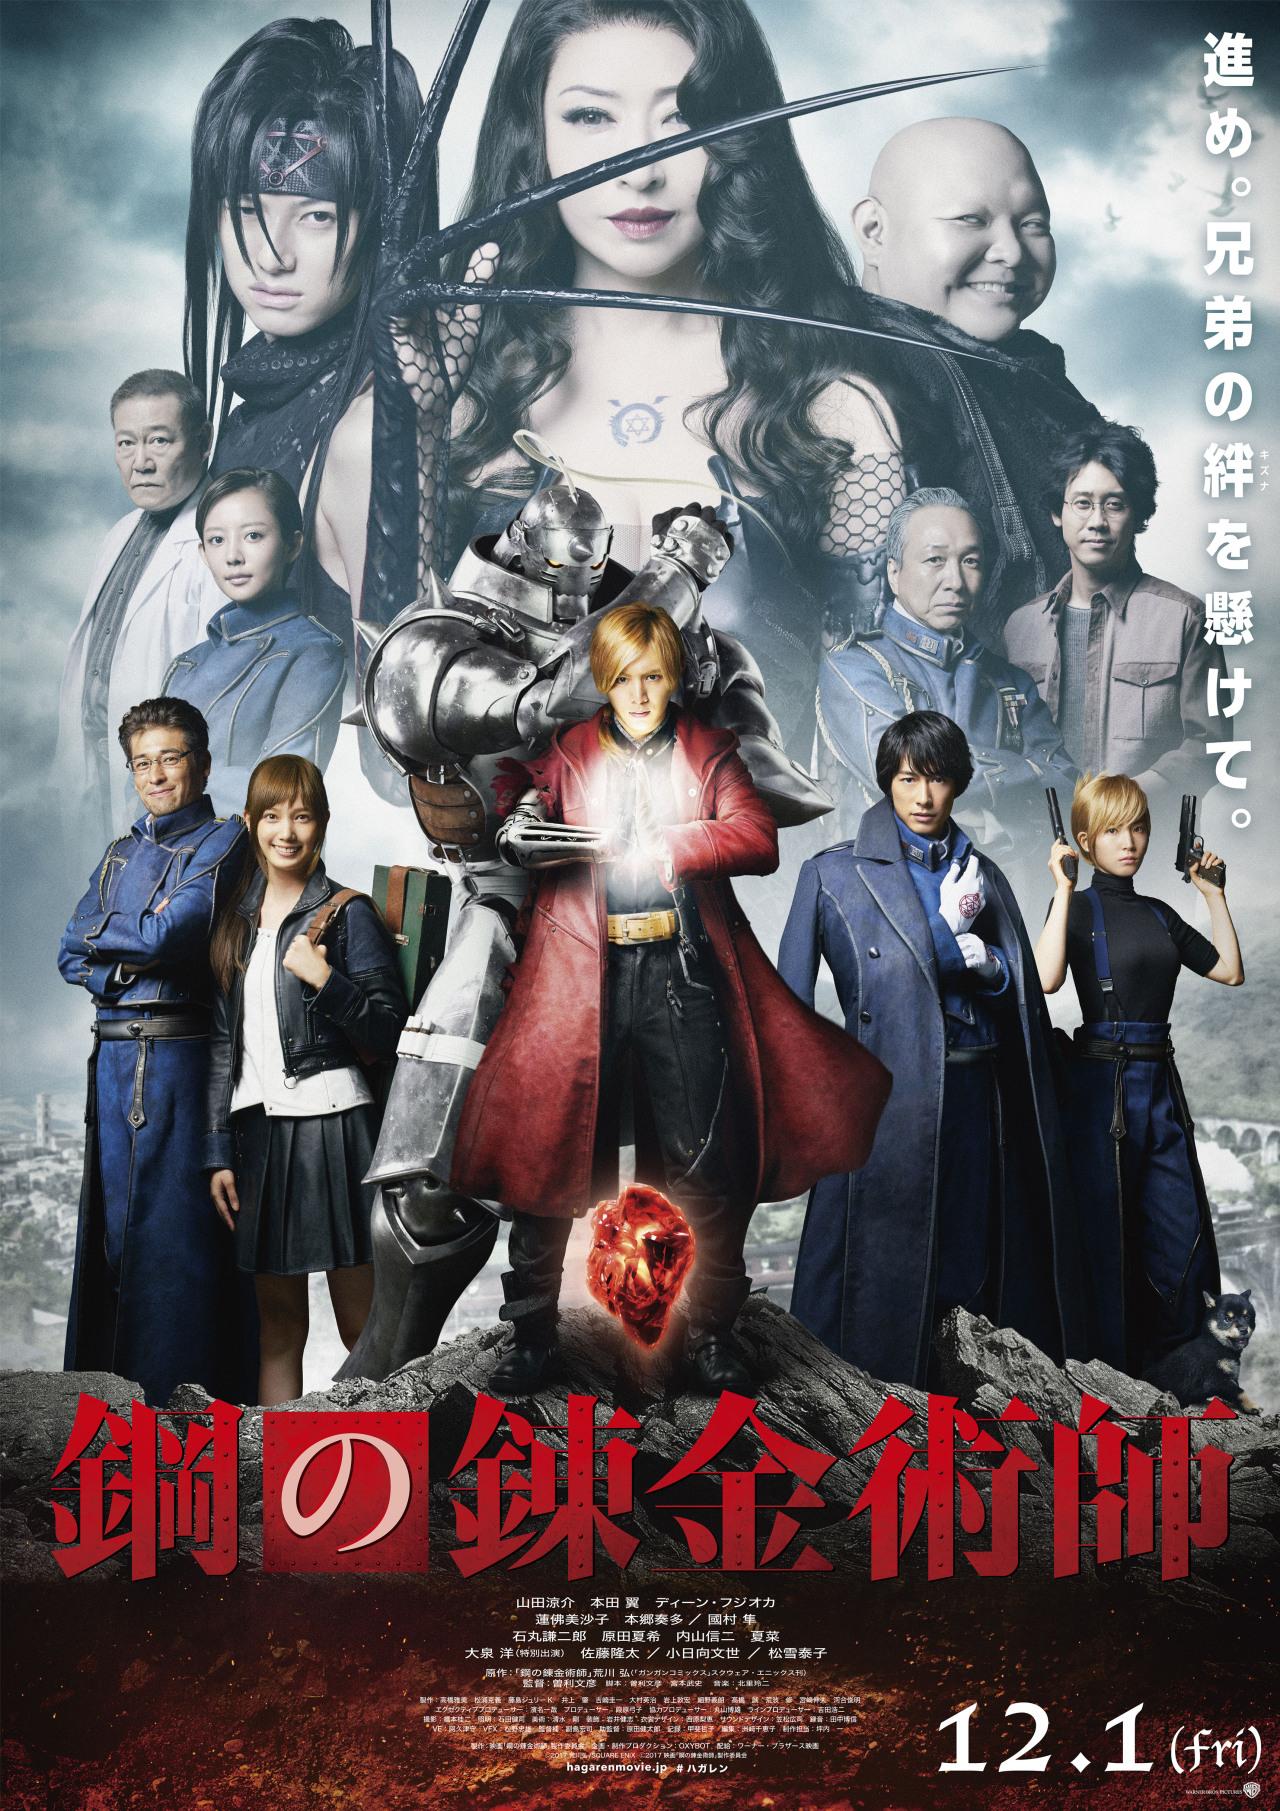 affiche du film Fullmetal Alchemist